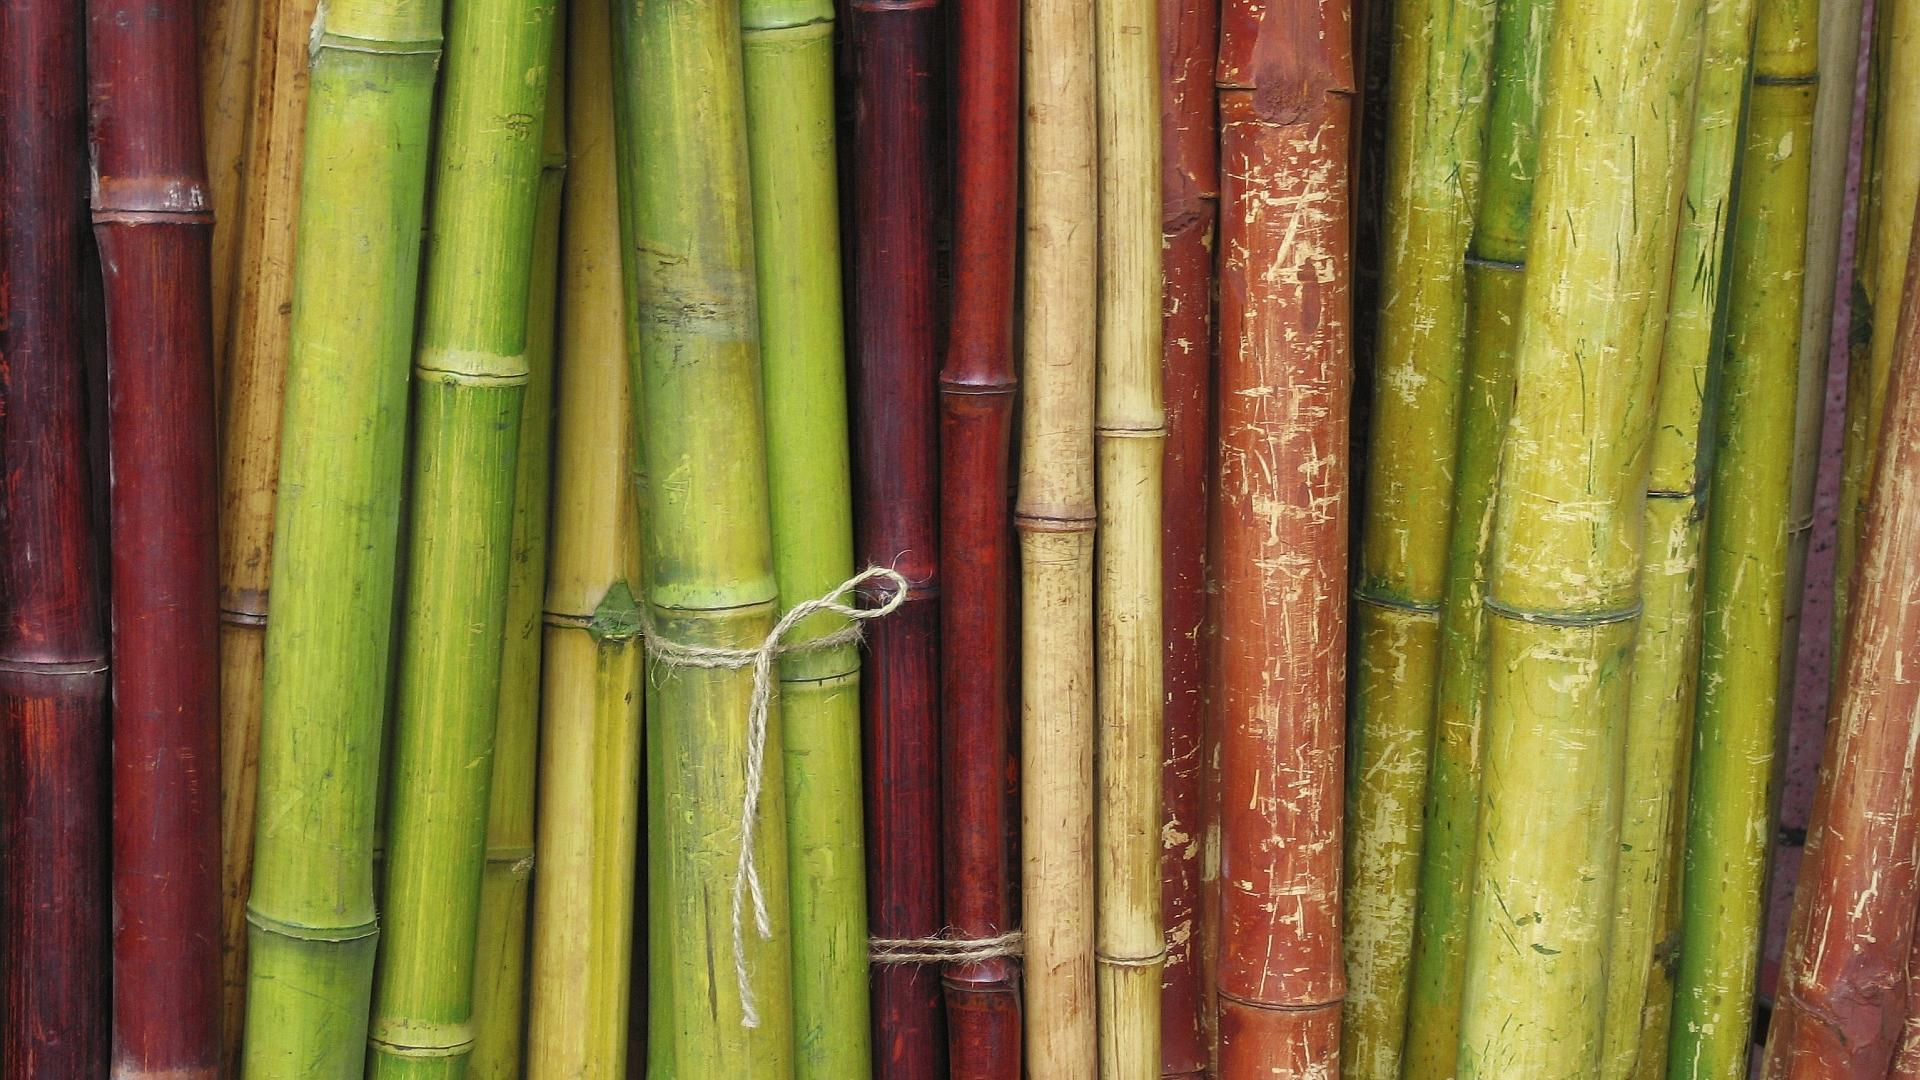 bamboo wallpaper 6505 1920x1080 px